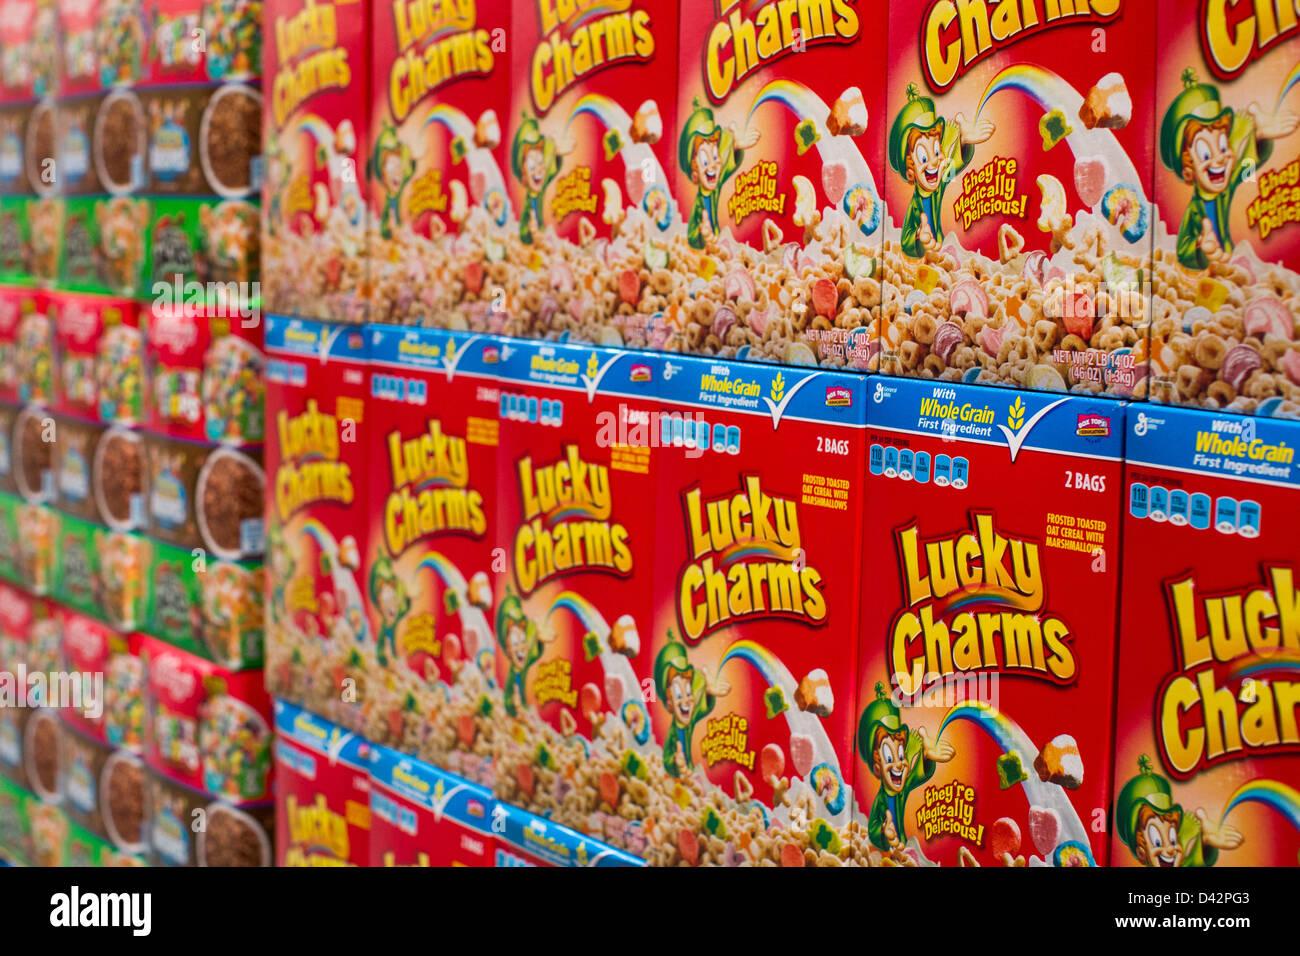 Cereal Store Stockfotos & Cereal Store Bilder - Alamy